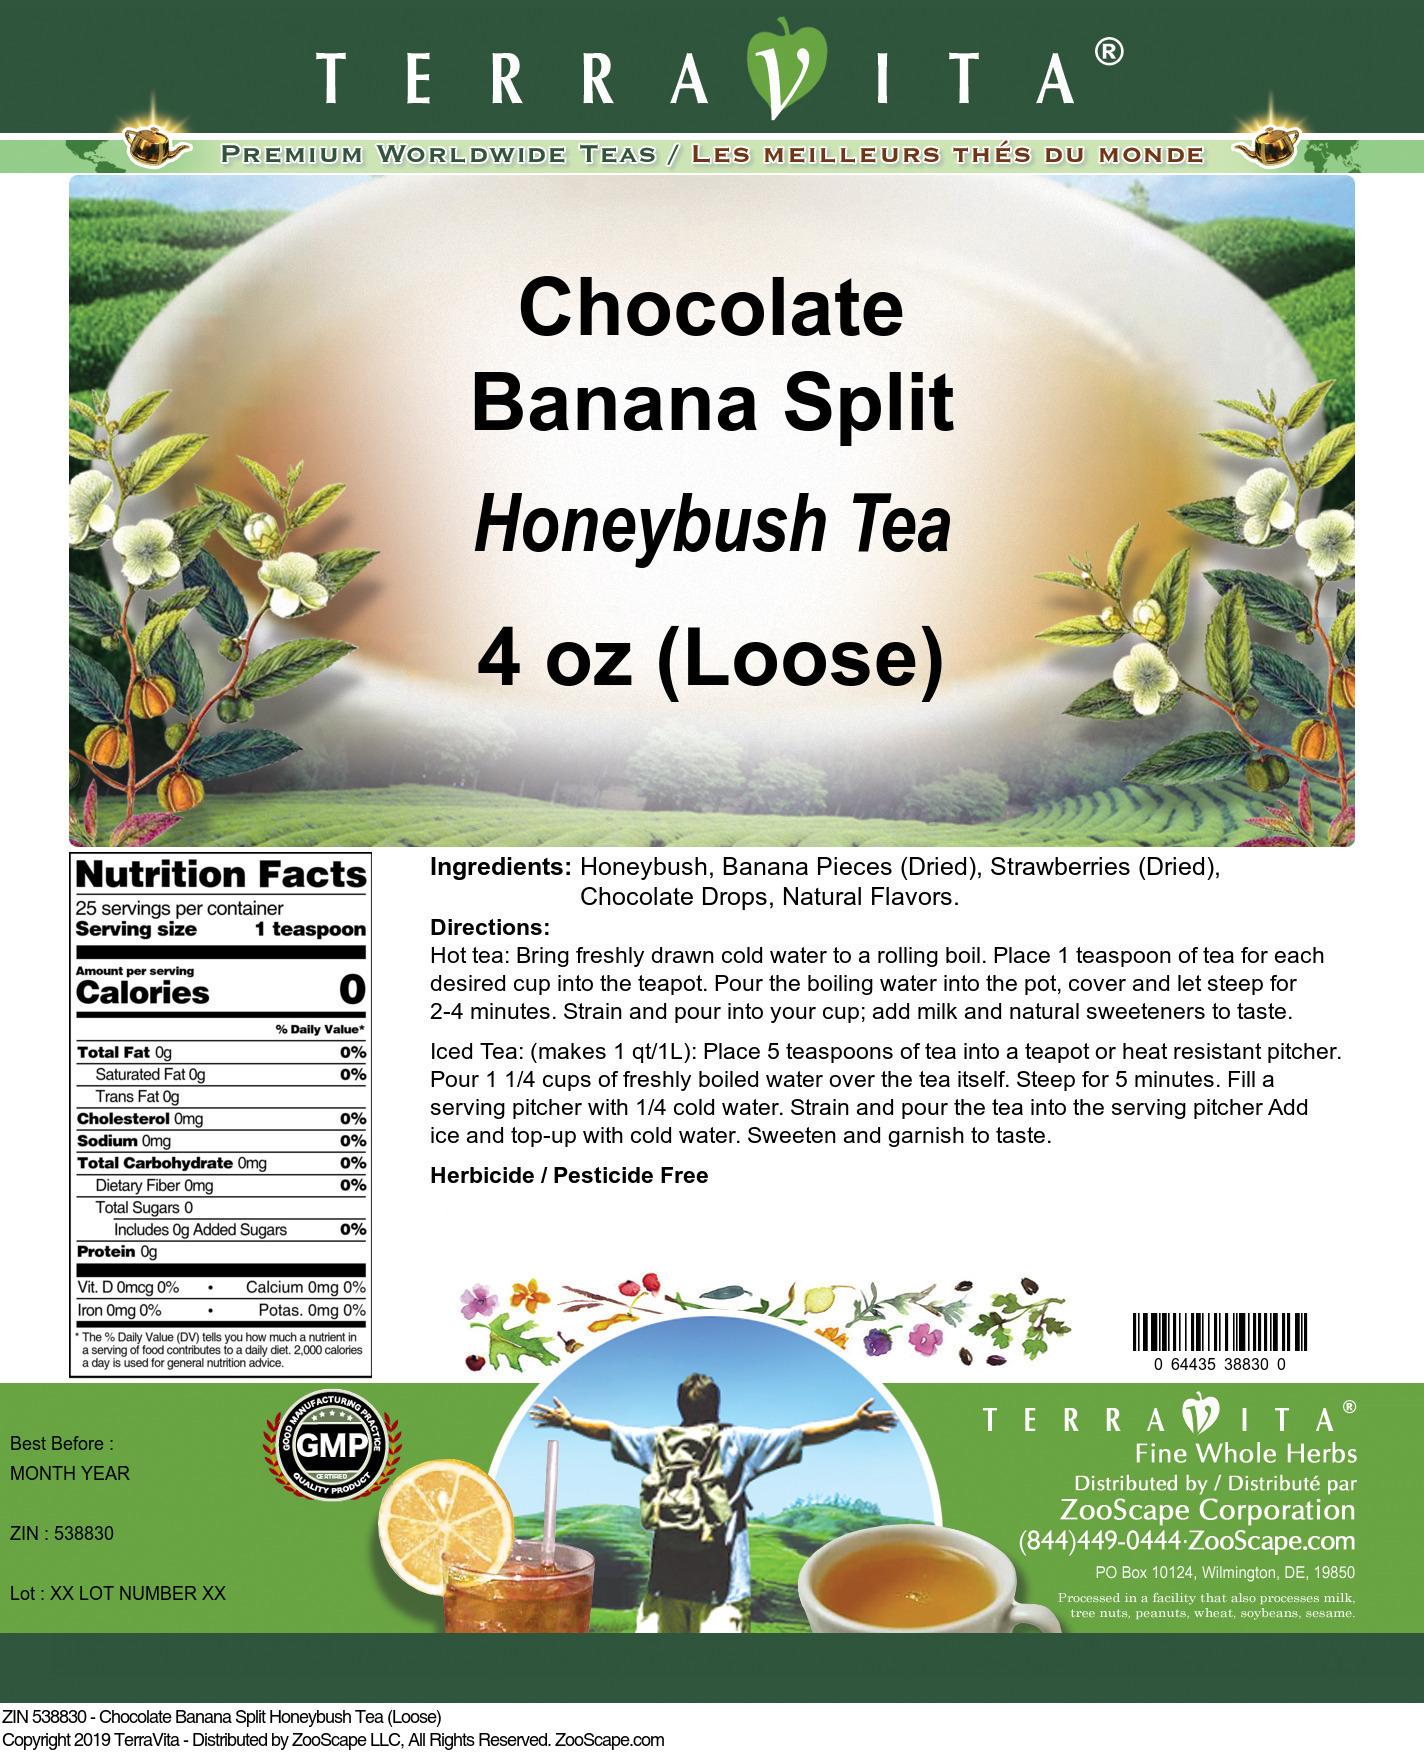 Chocolate Banana Split Honeybush Tea (Loose)